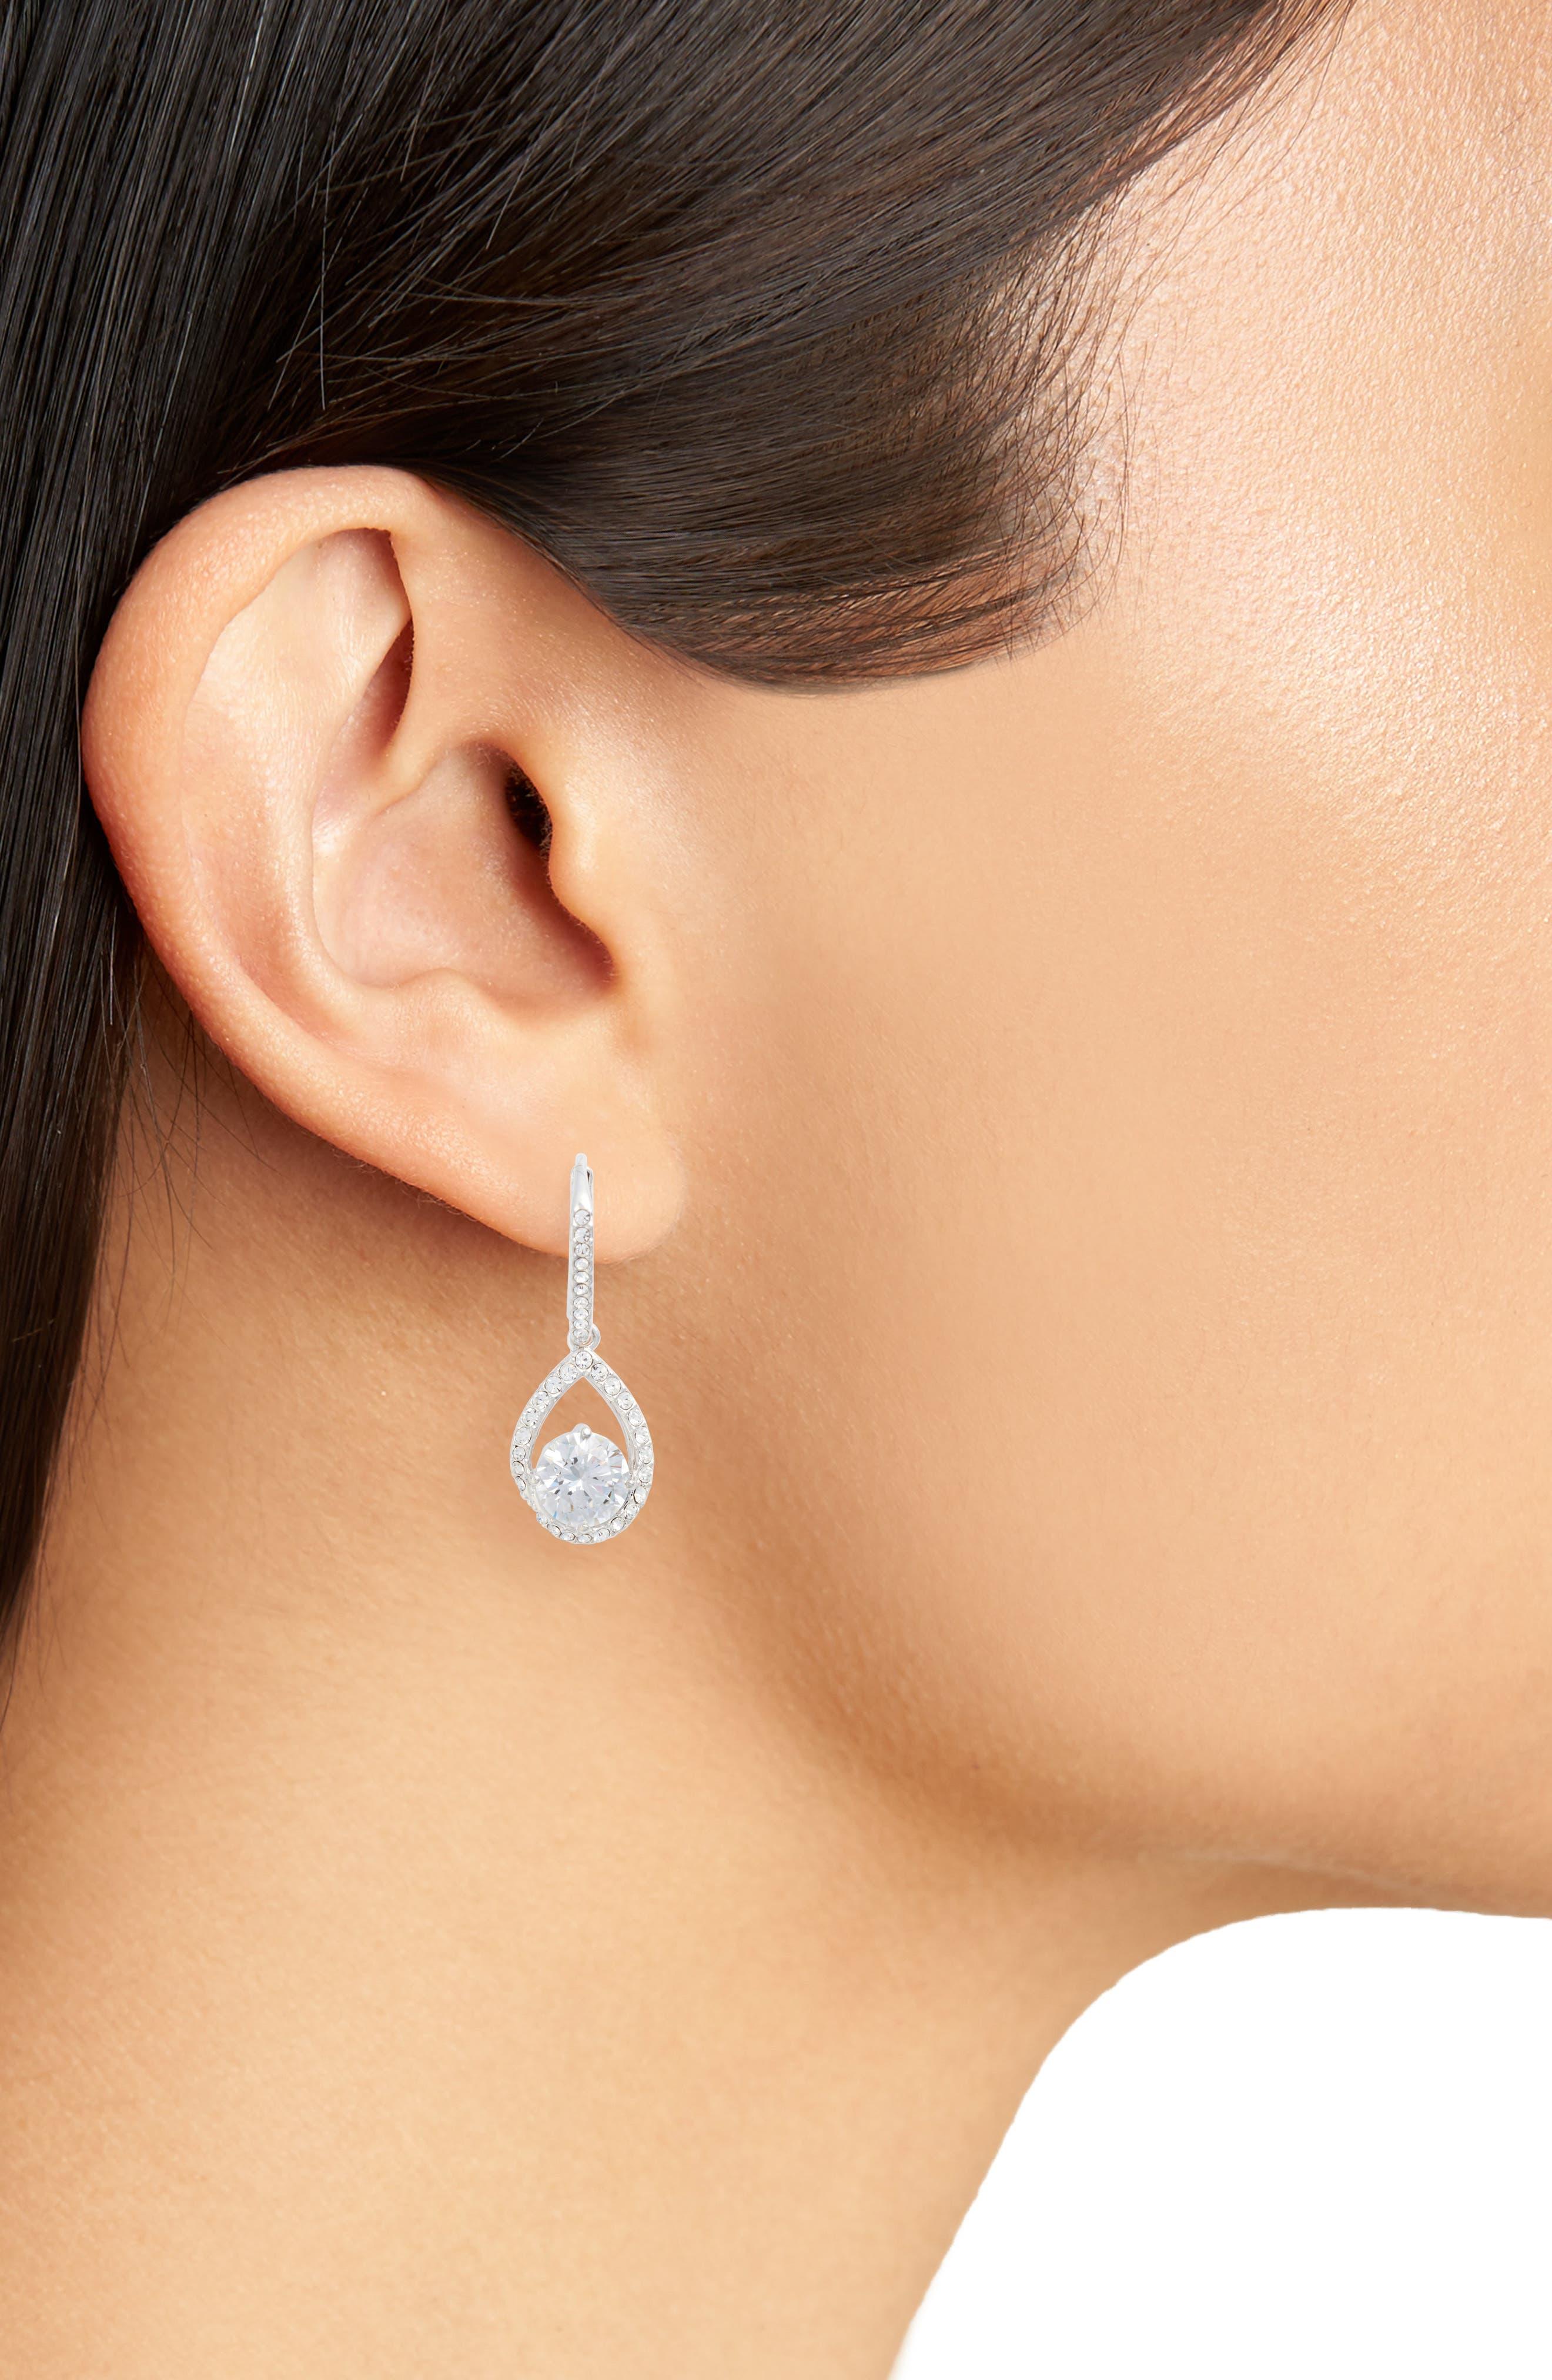 Cubic Zirconia Pear Drop Earrings,                             Alternate thumbnail 2, color,                             SILVER